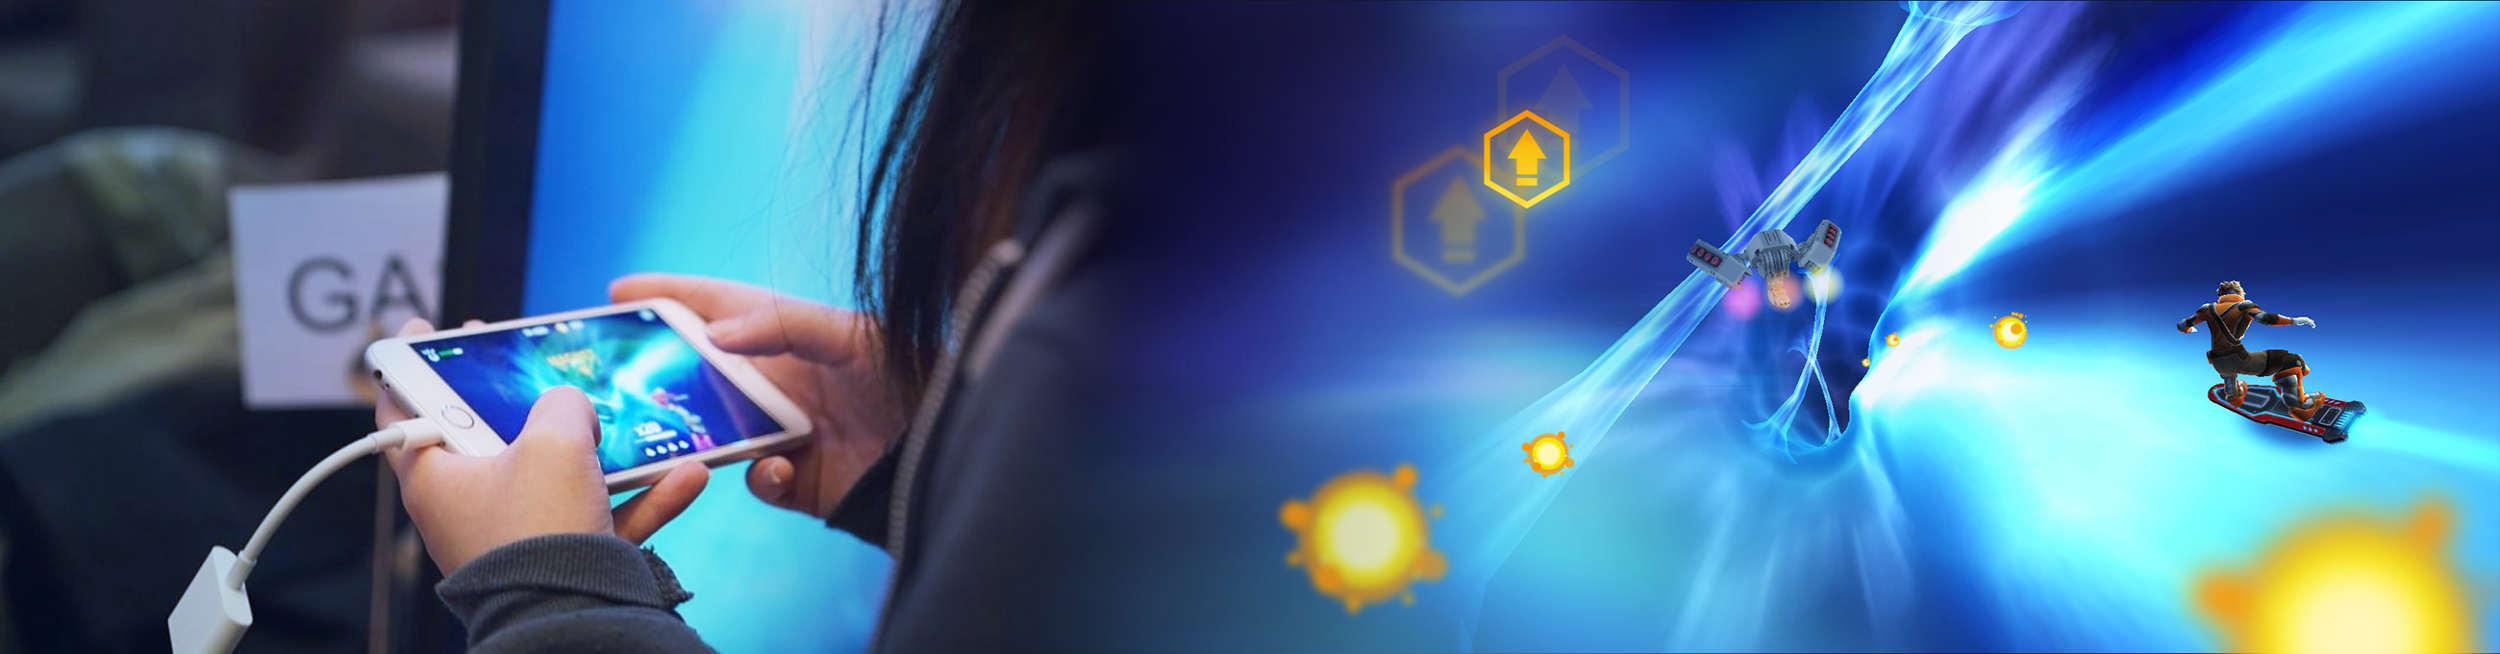 game_banner-WEB.jpg